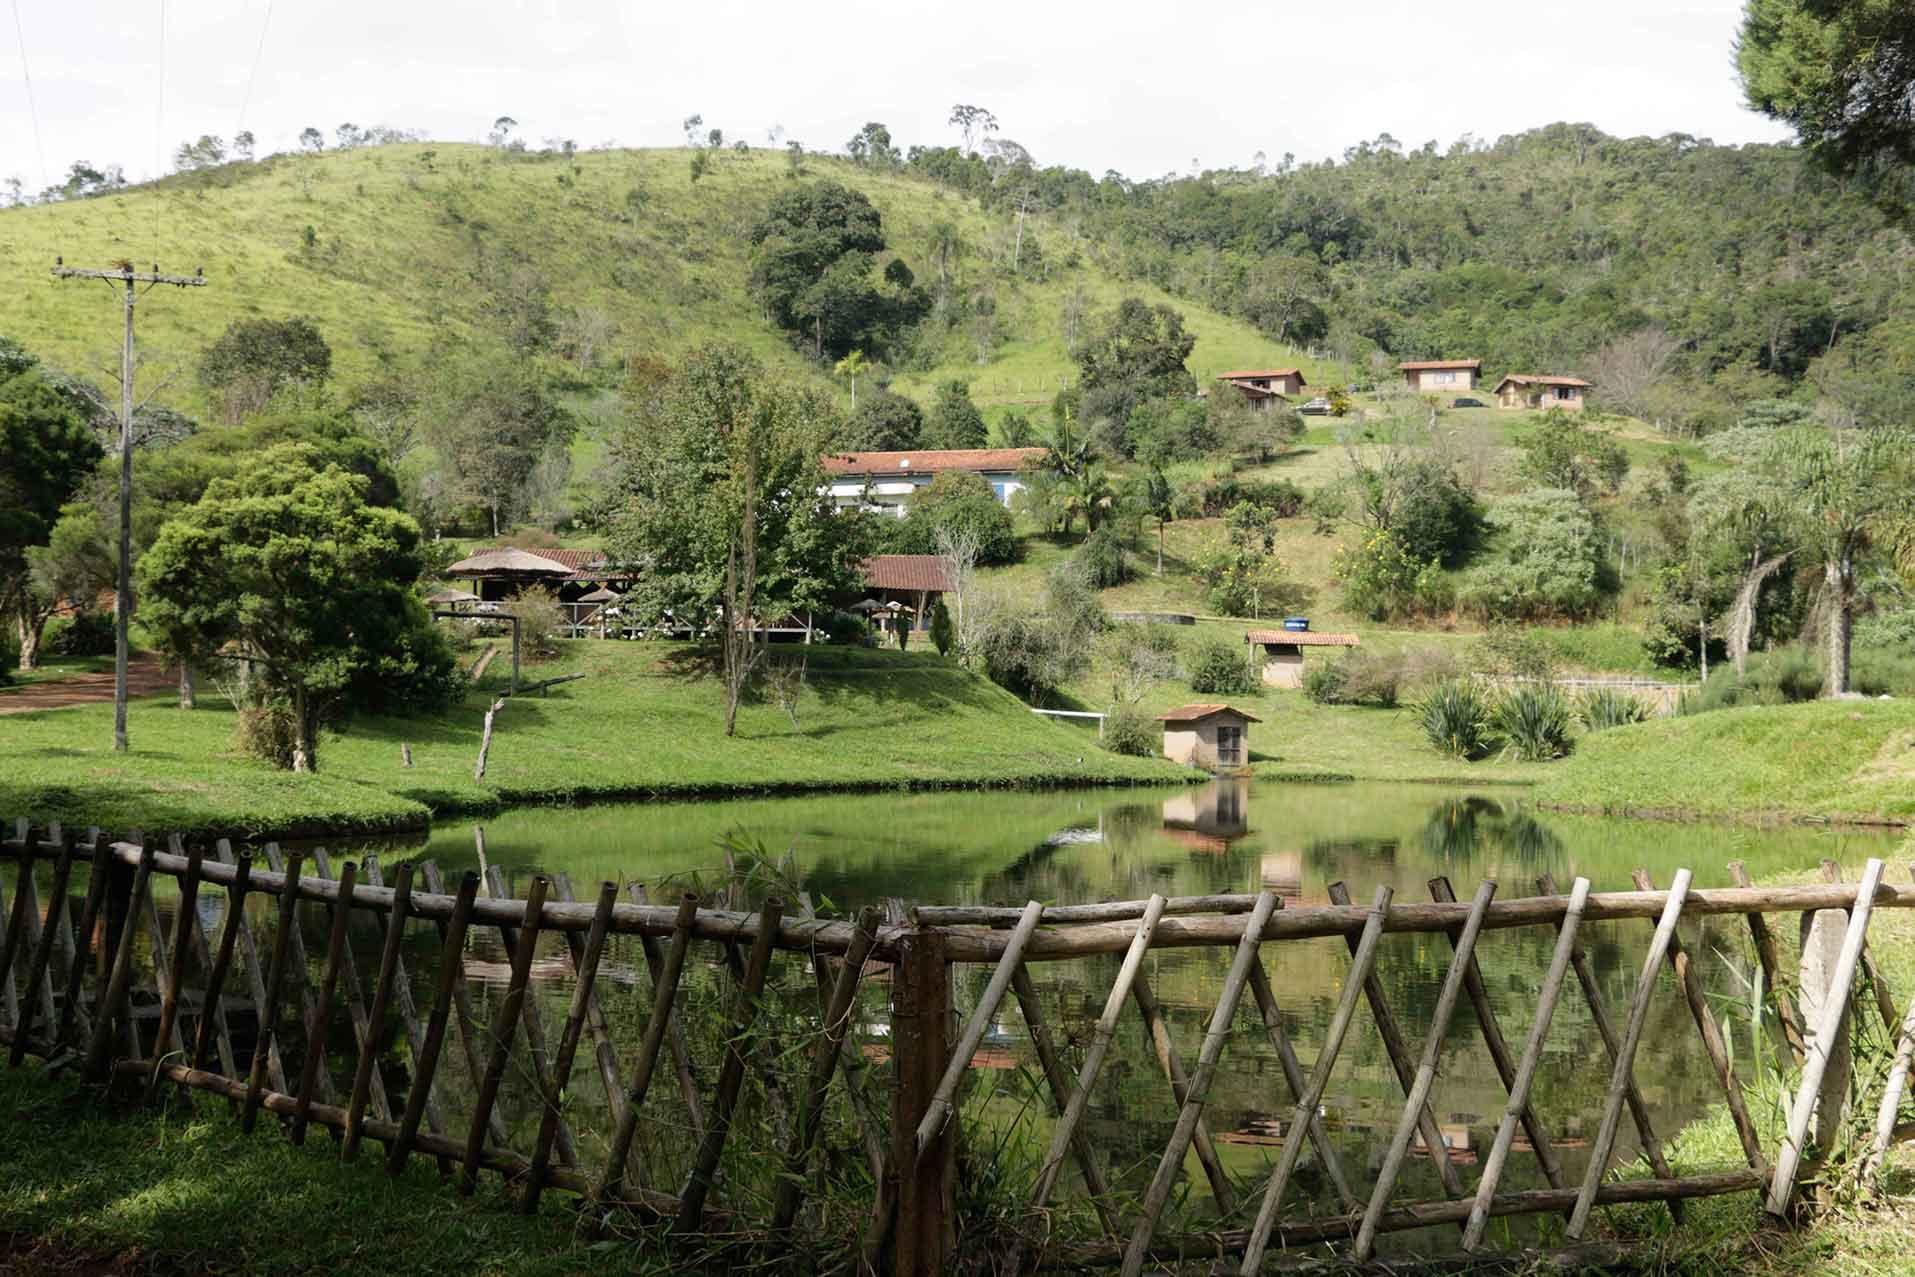 Santo-Antonio-do-Pinhal-Turismo-Rural-Sitio-Matao-_MG_6179-bx